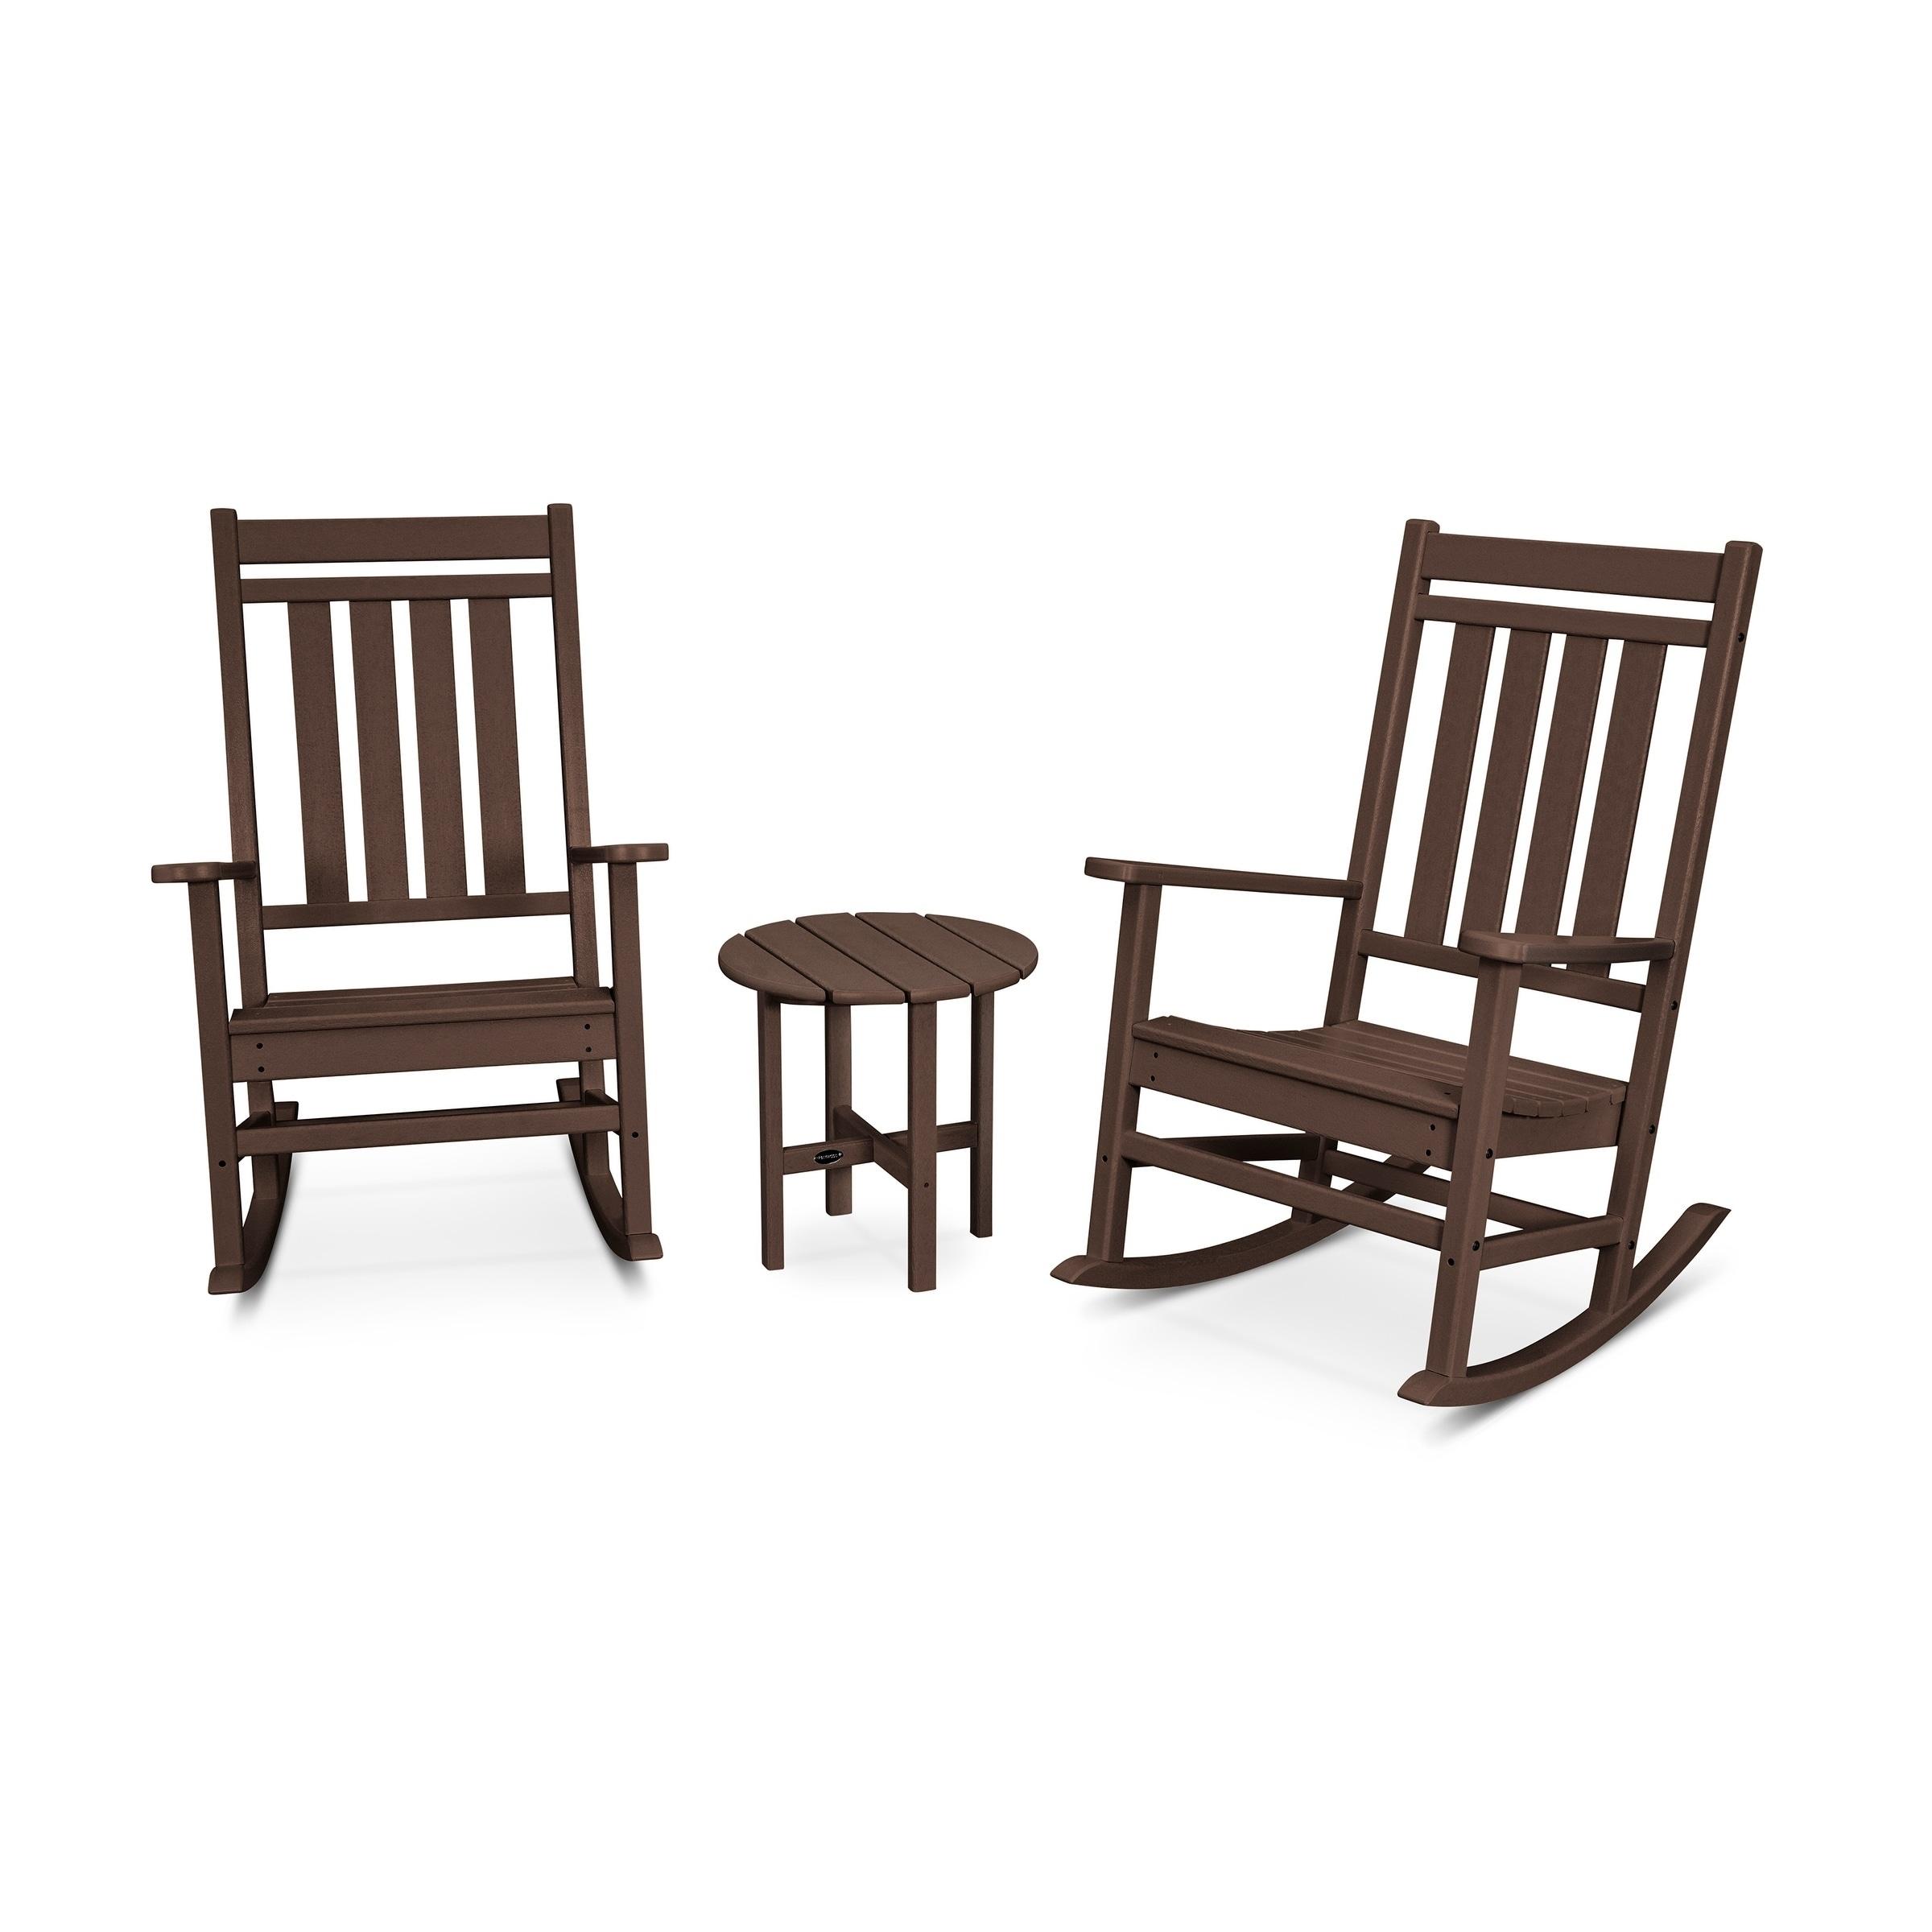 Plantation 3 Piece Porch Rocking Chair